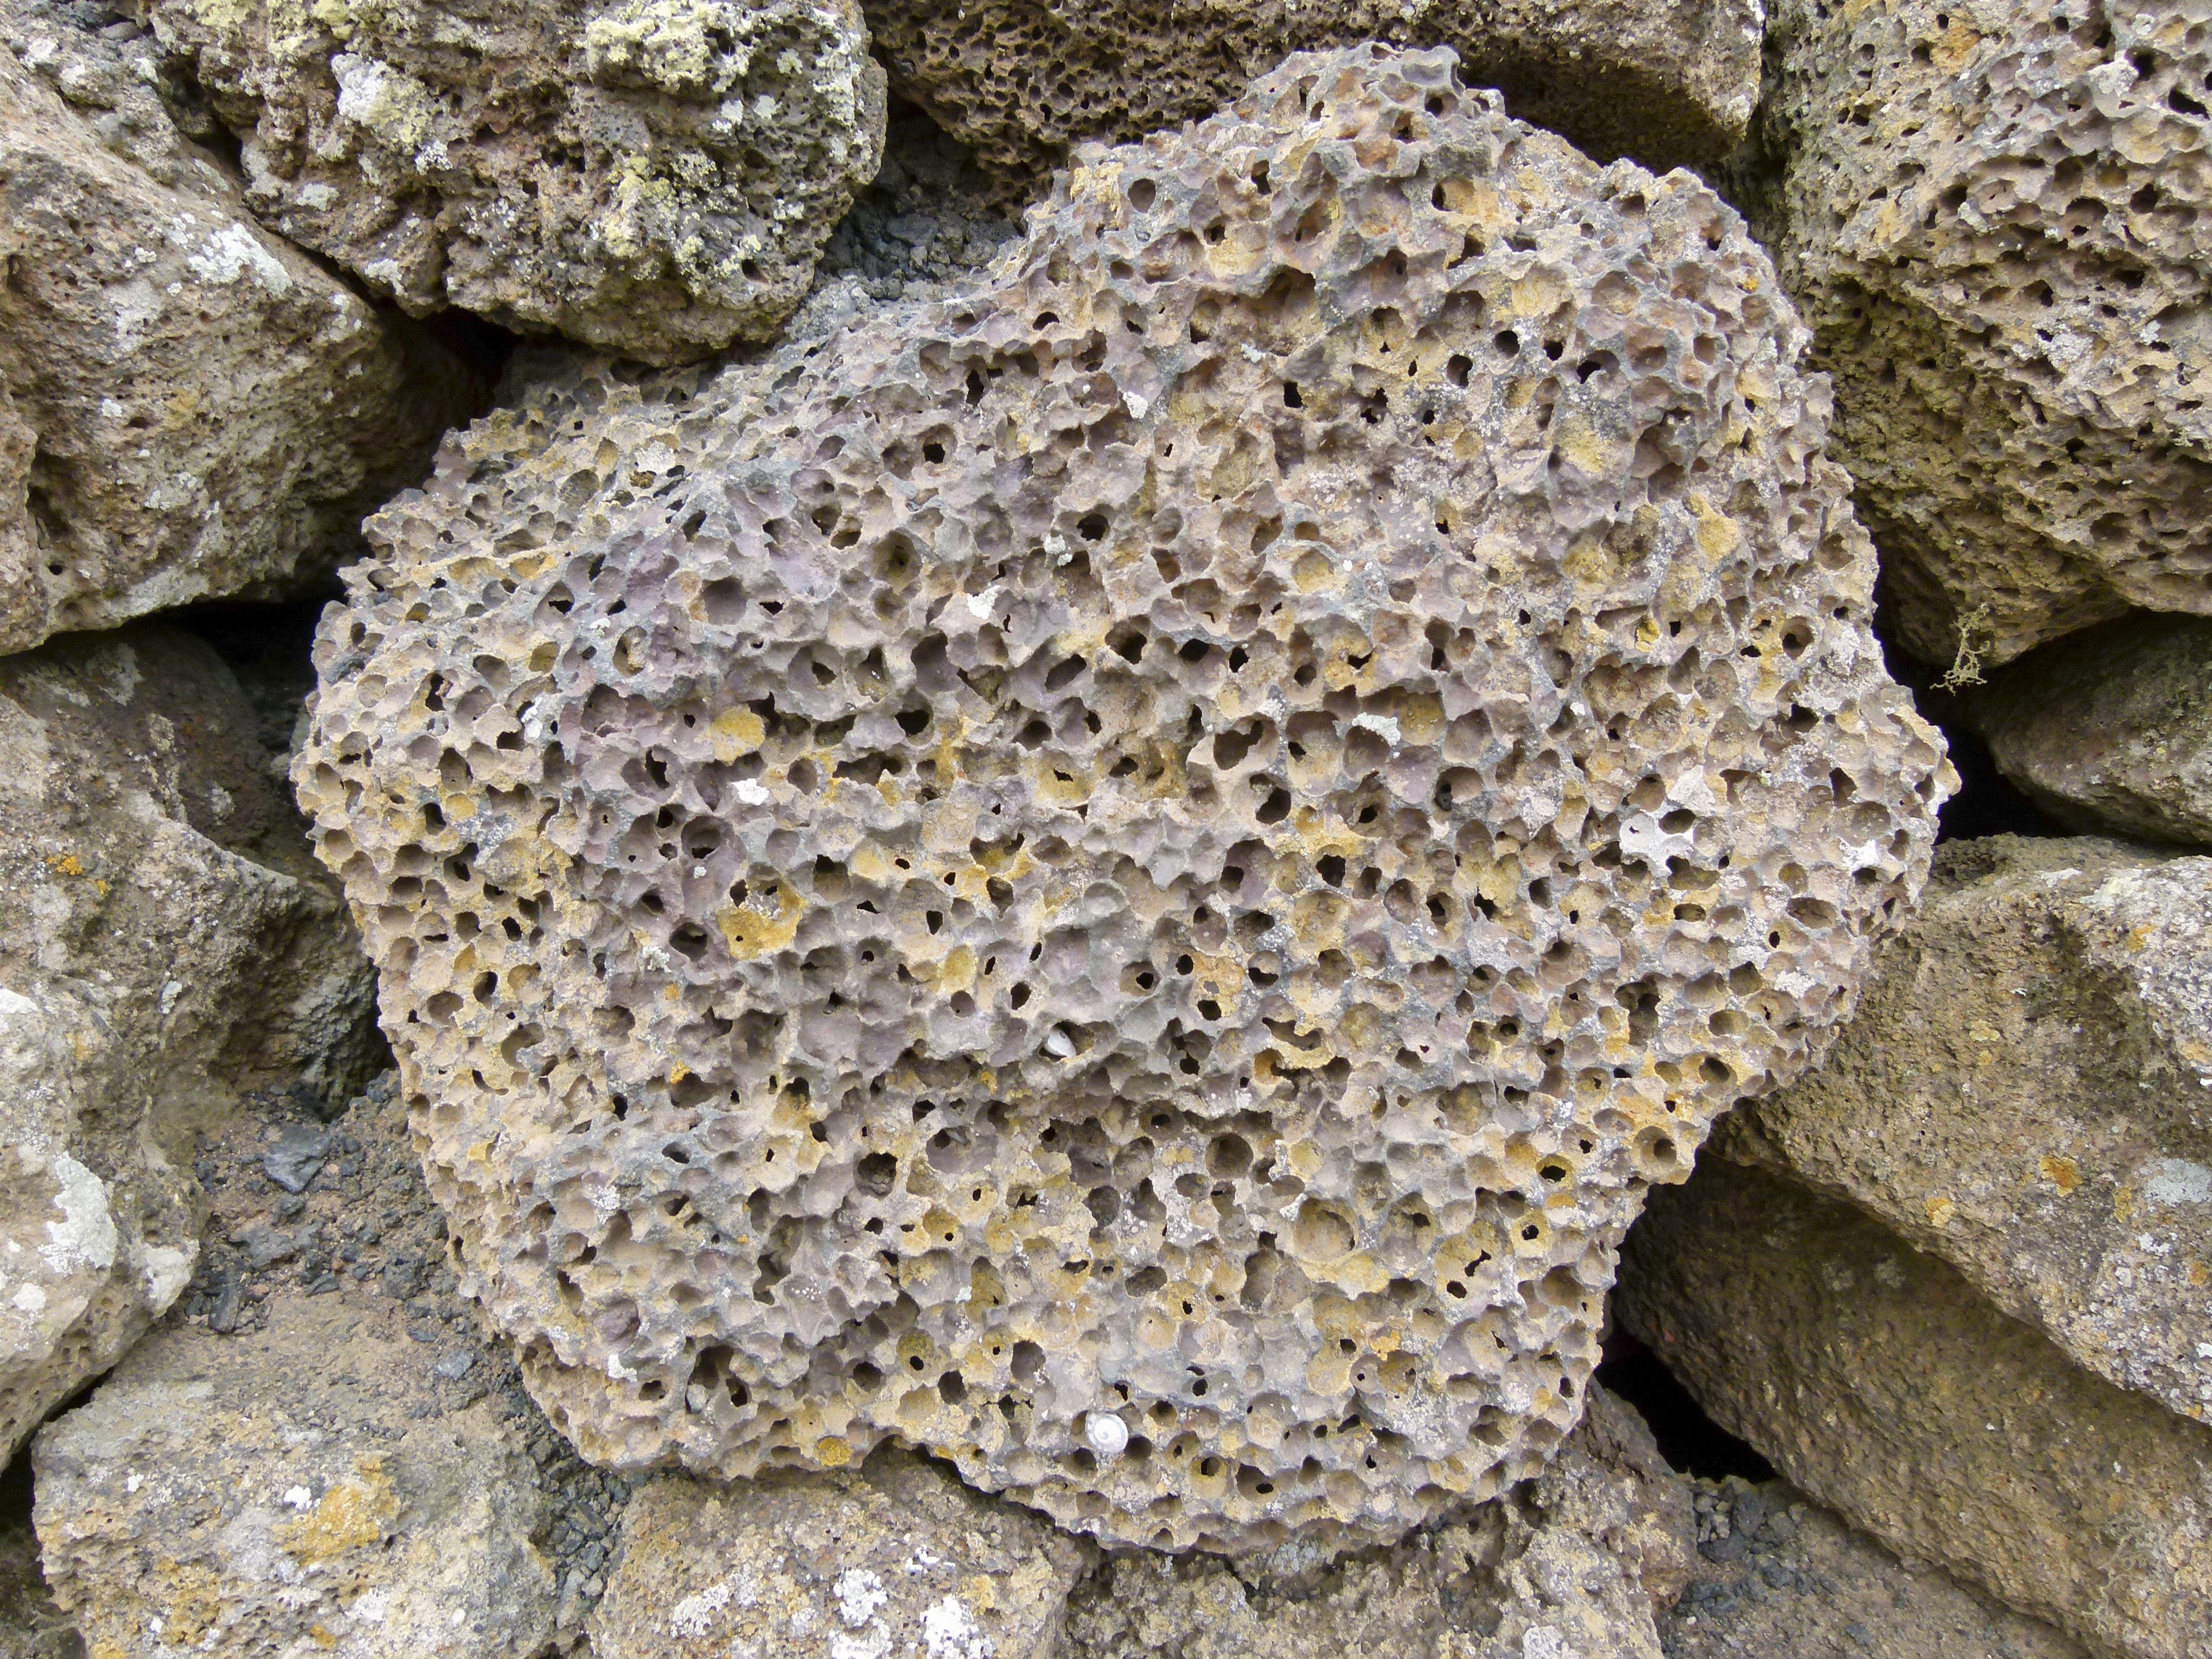 Large pumice stone among other rocks.